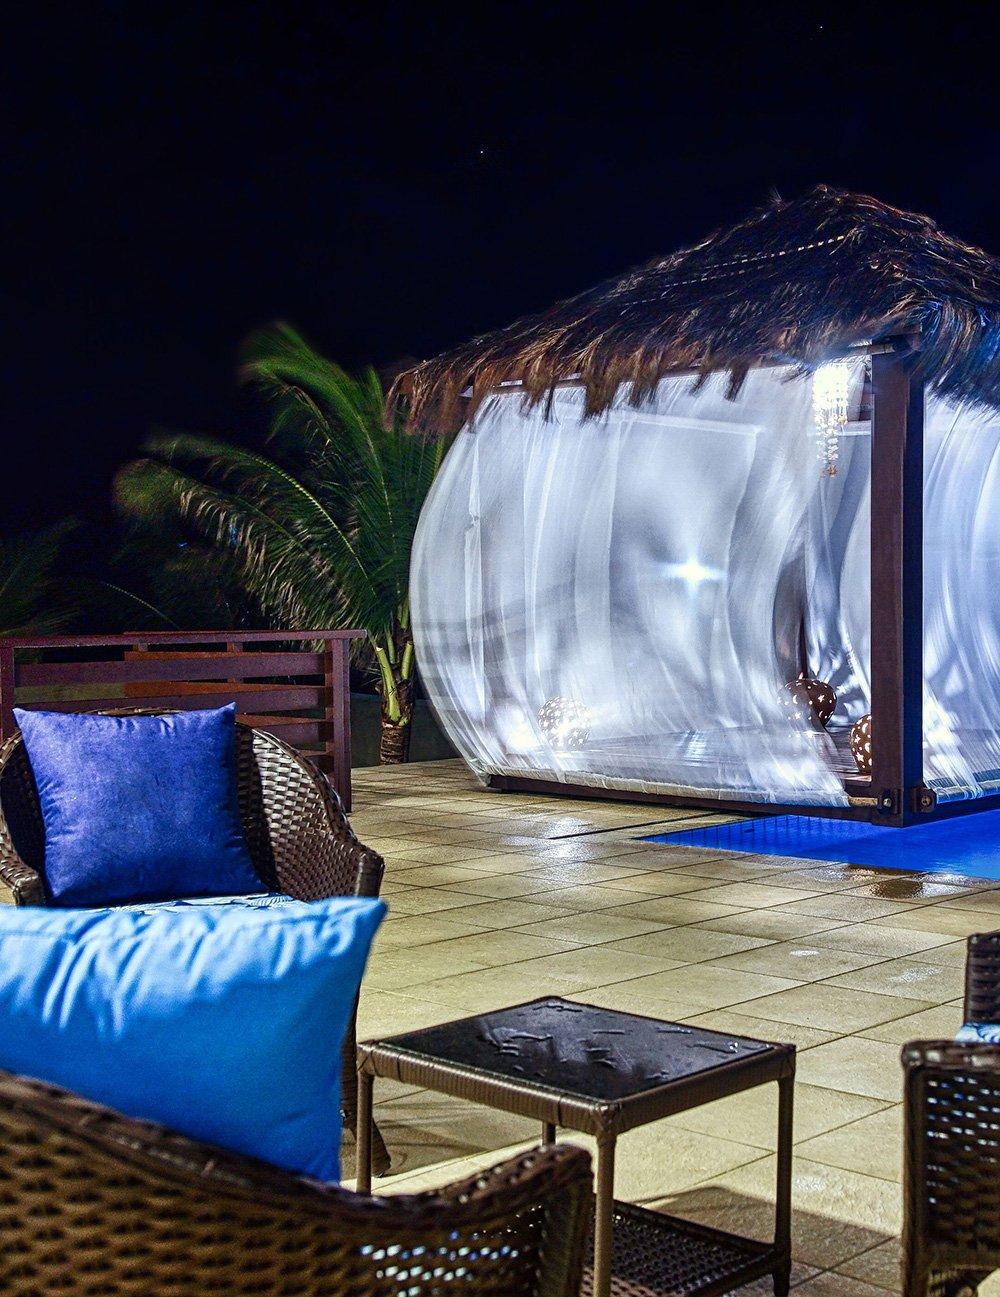 Casa-de-praia-para-alugar_jantarRomantico